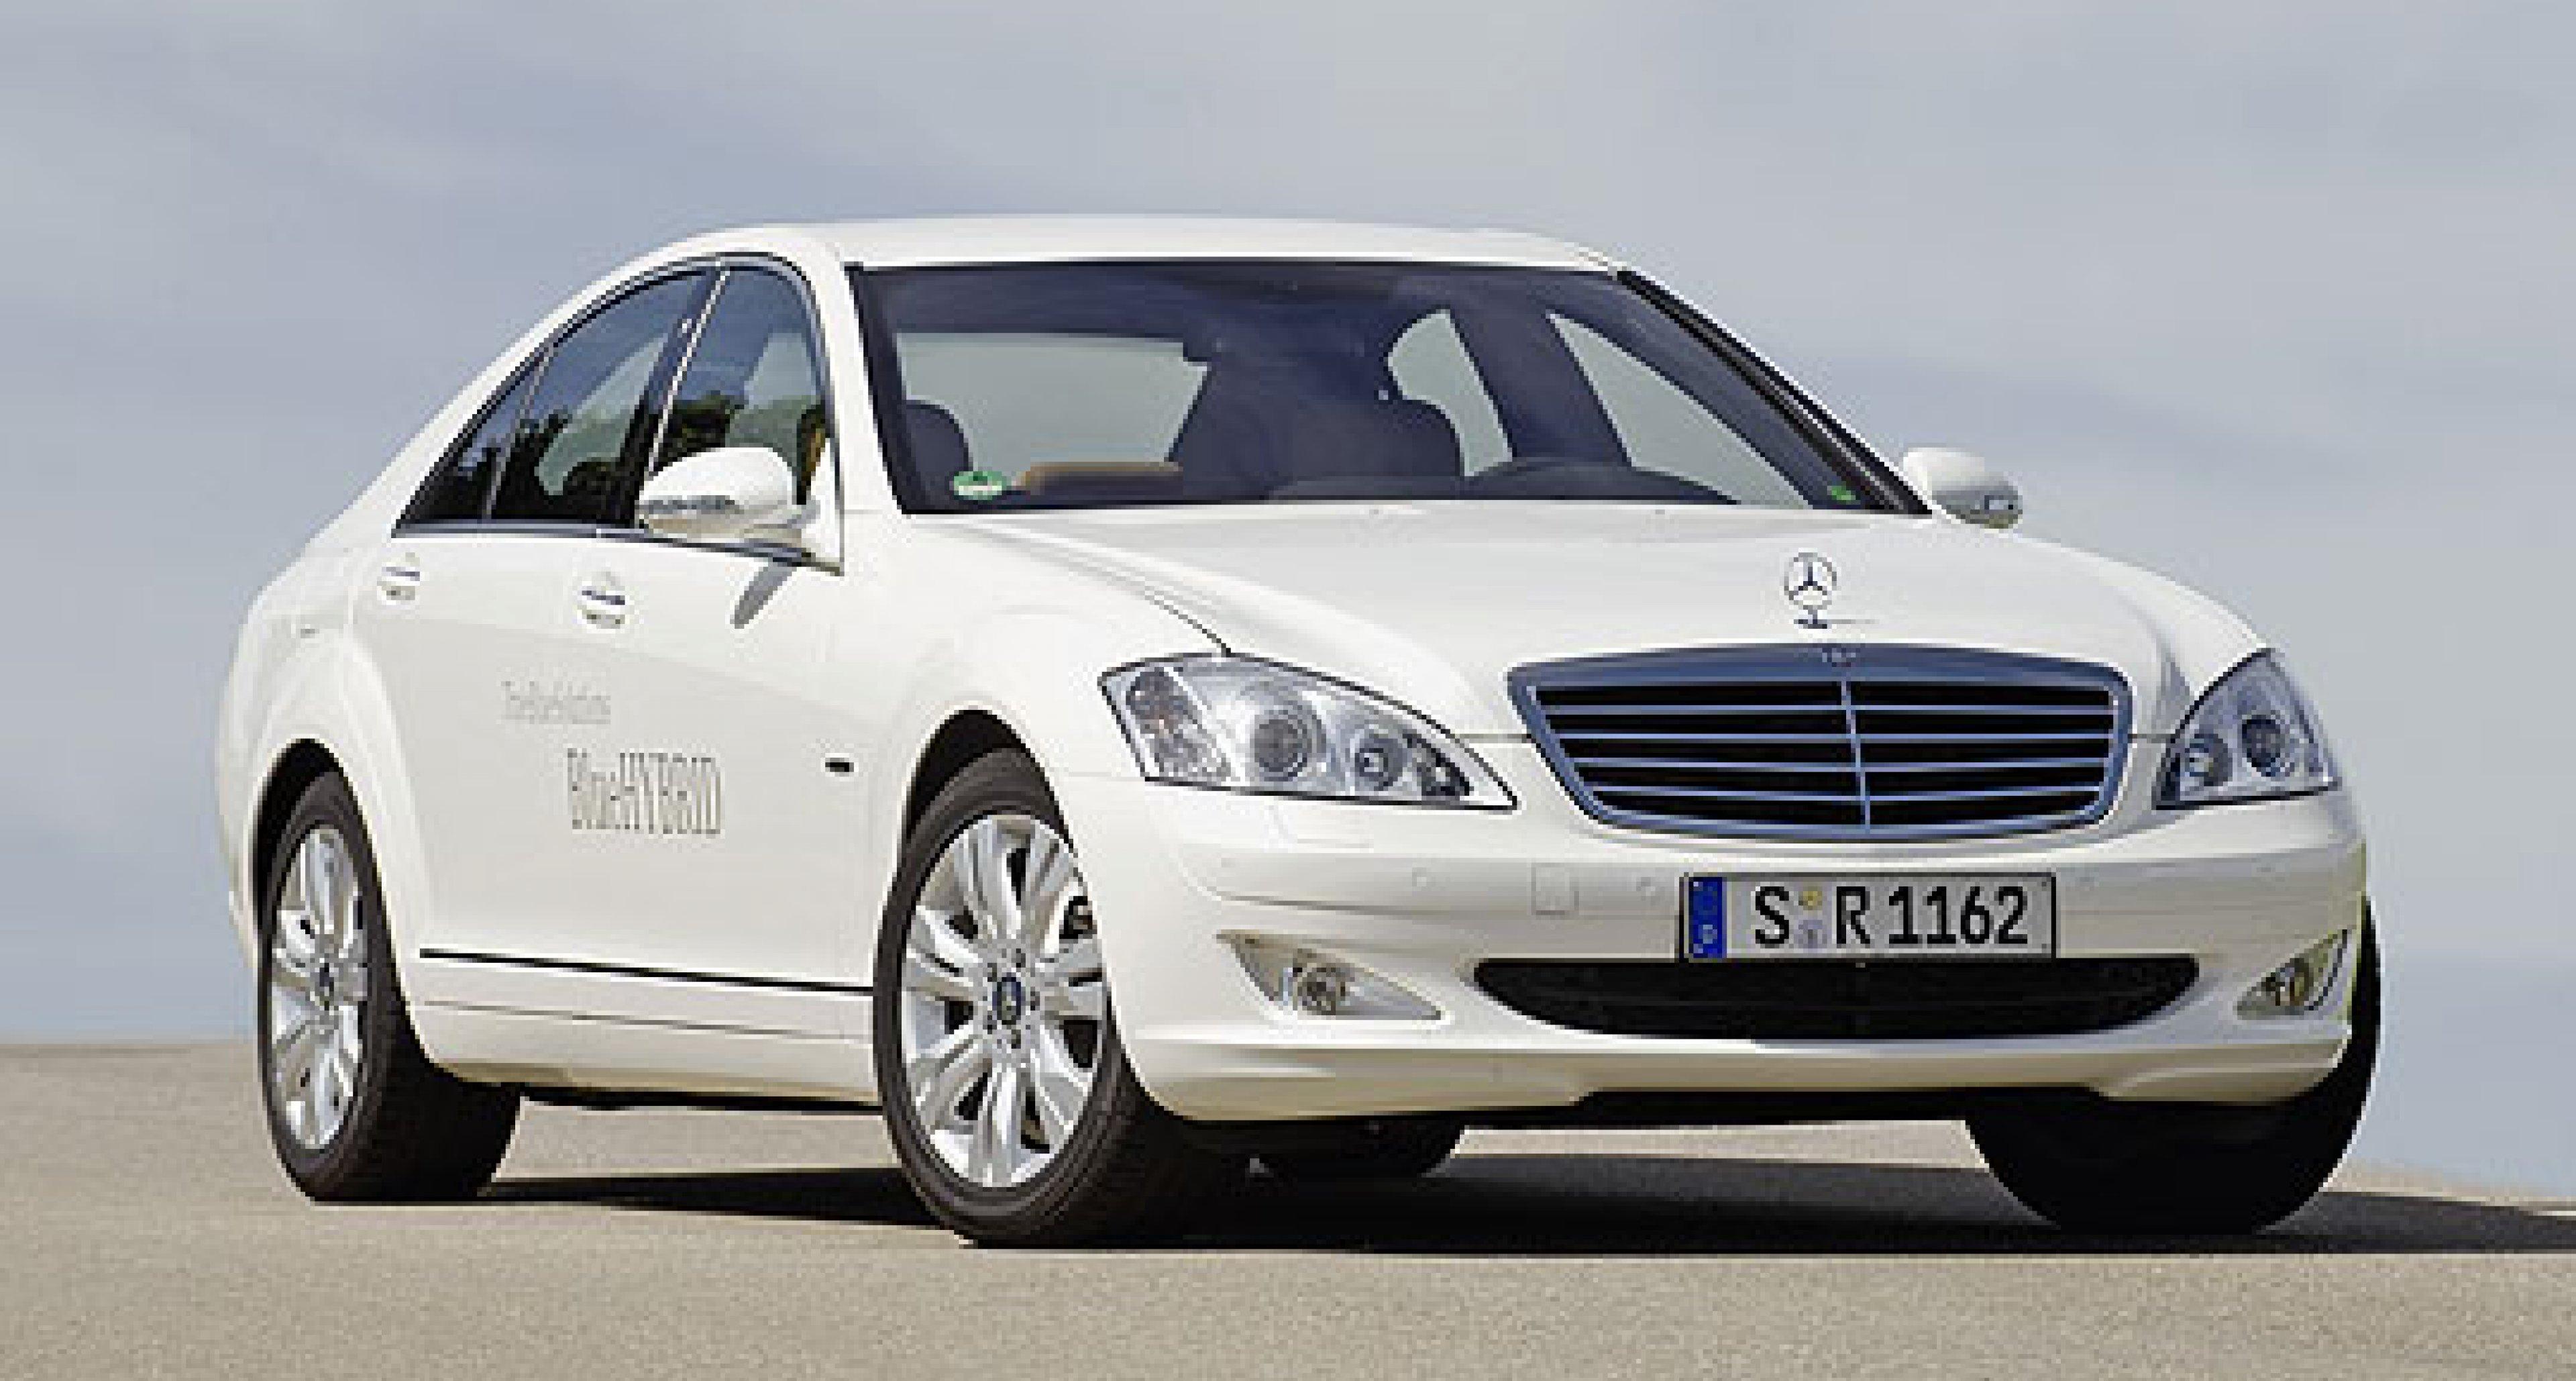 Mercedes-Benz S 400 BlueHybrid: Allez les bleus